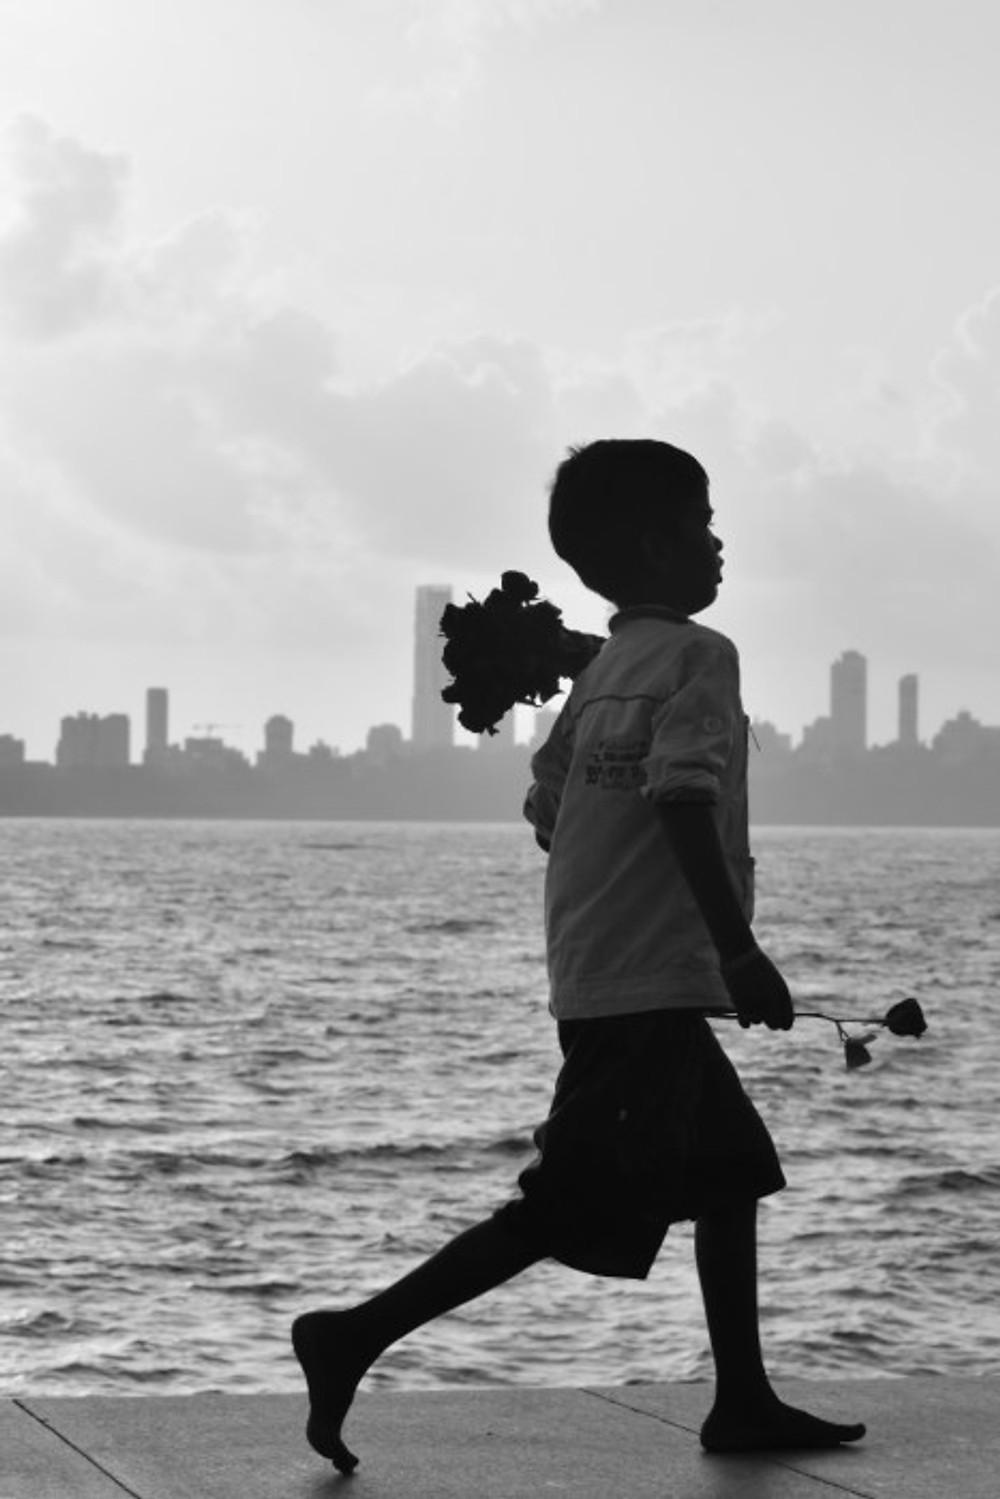 venditore di rose su marine drive, mumbai